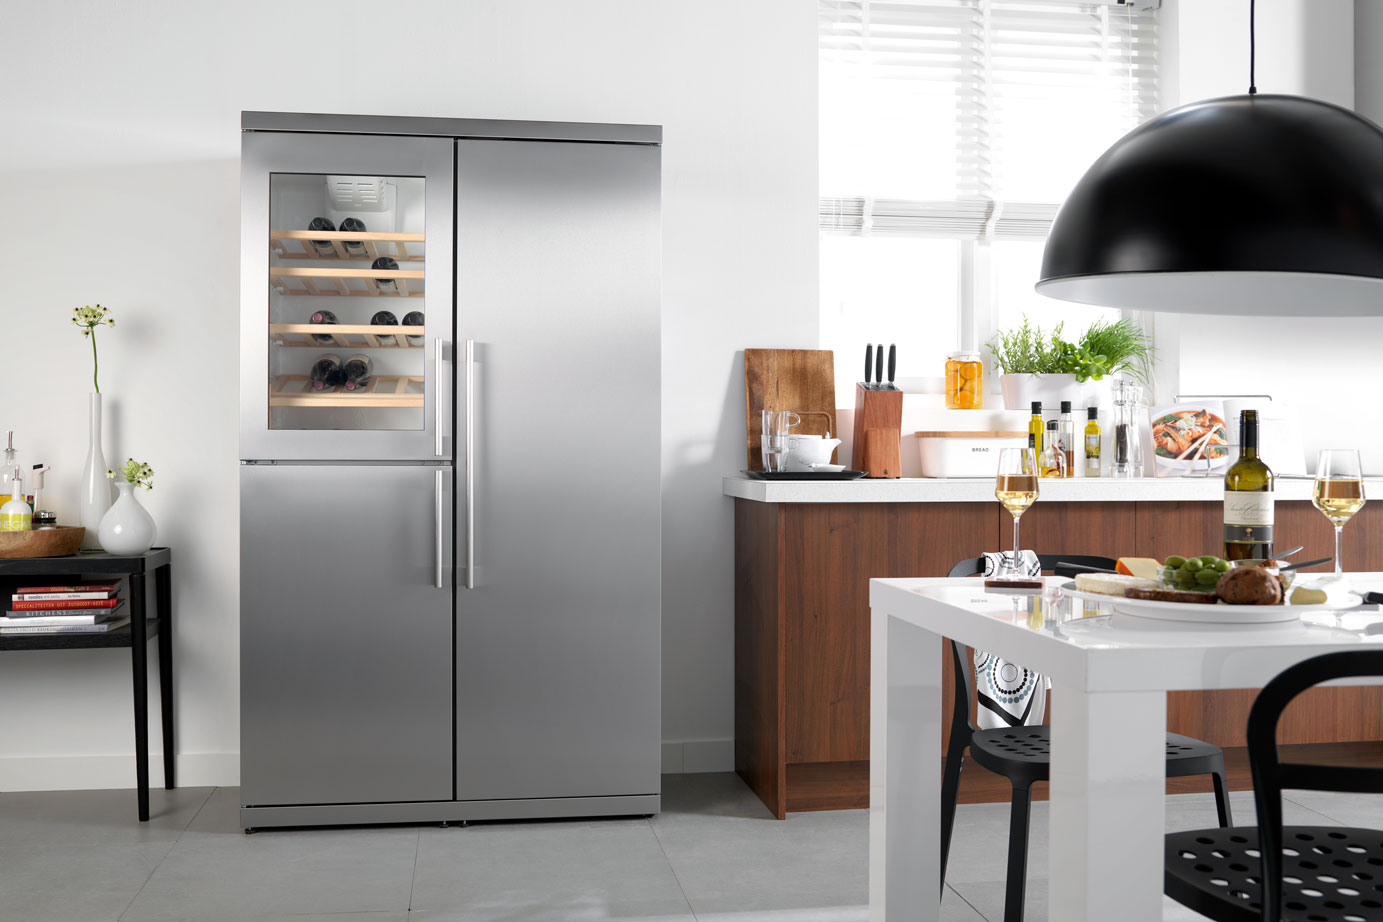 Amerikaanse Keuken Kopen : 25-jarig jubileum DB KeukenGroep